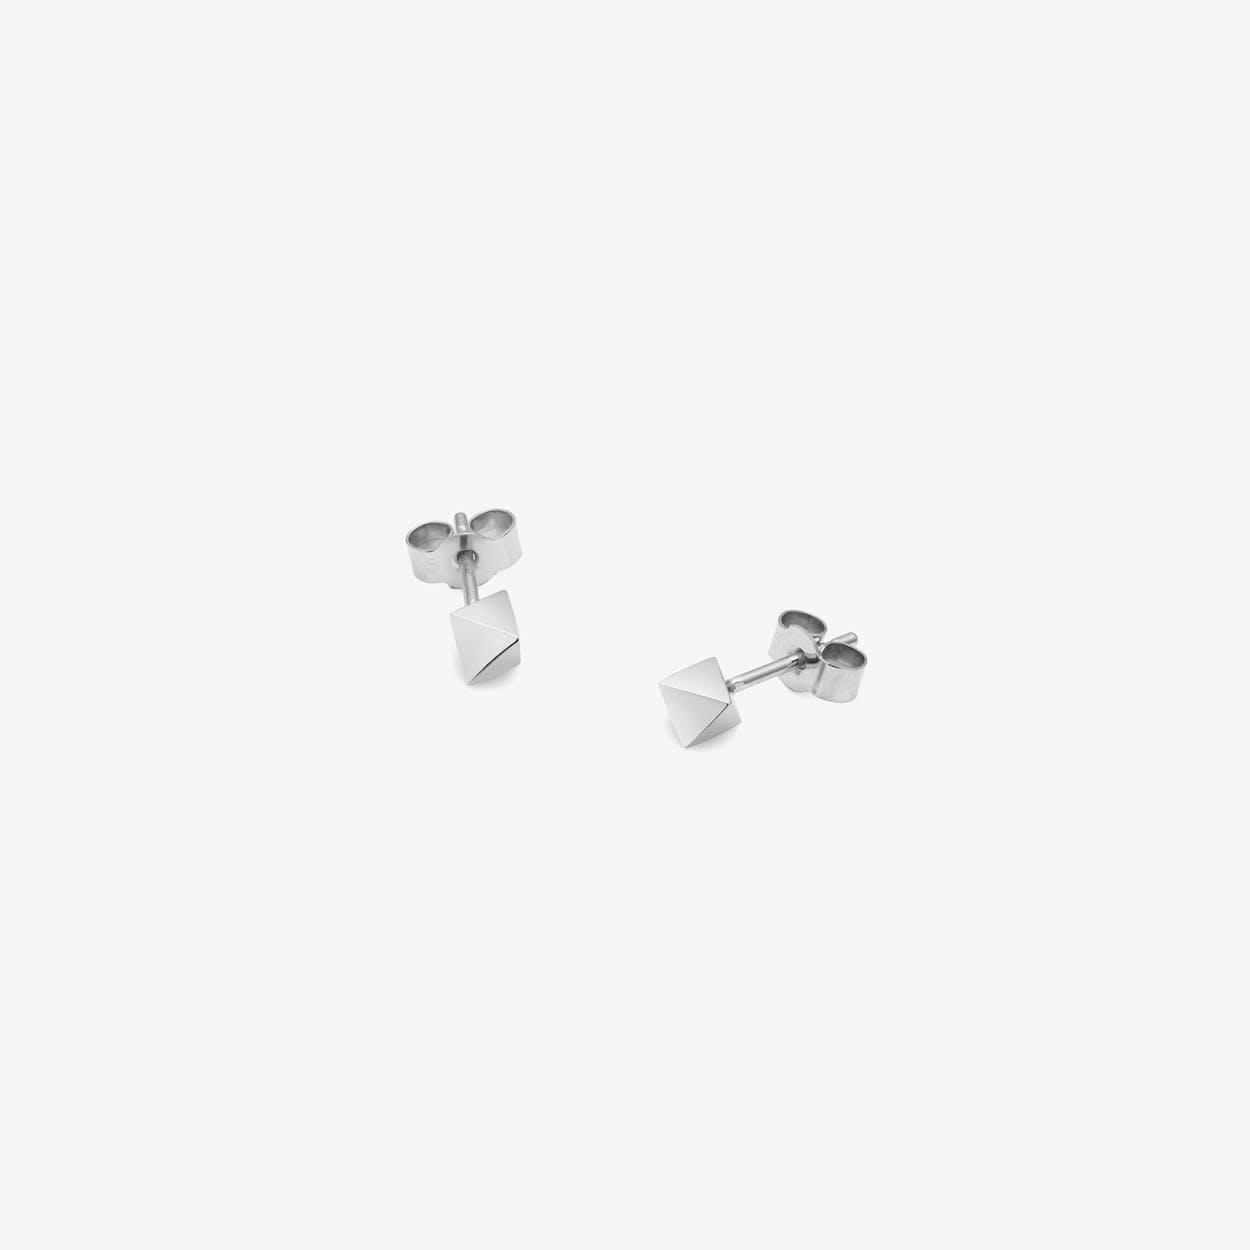 Octahedron Stud Earrings in Silver